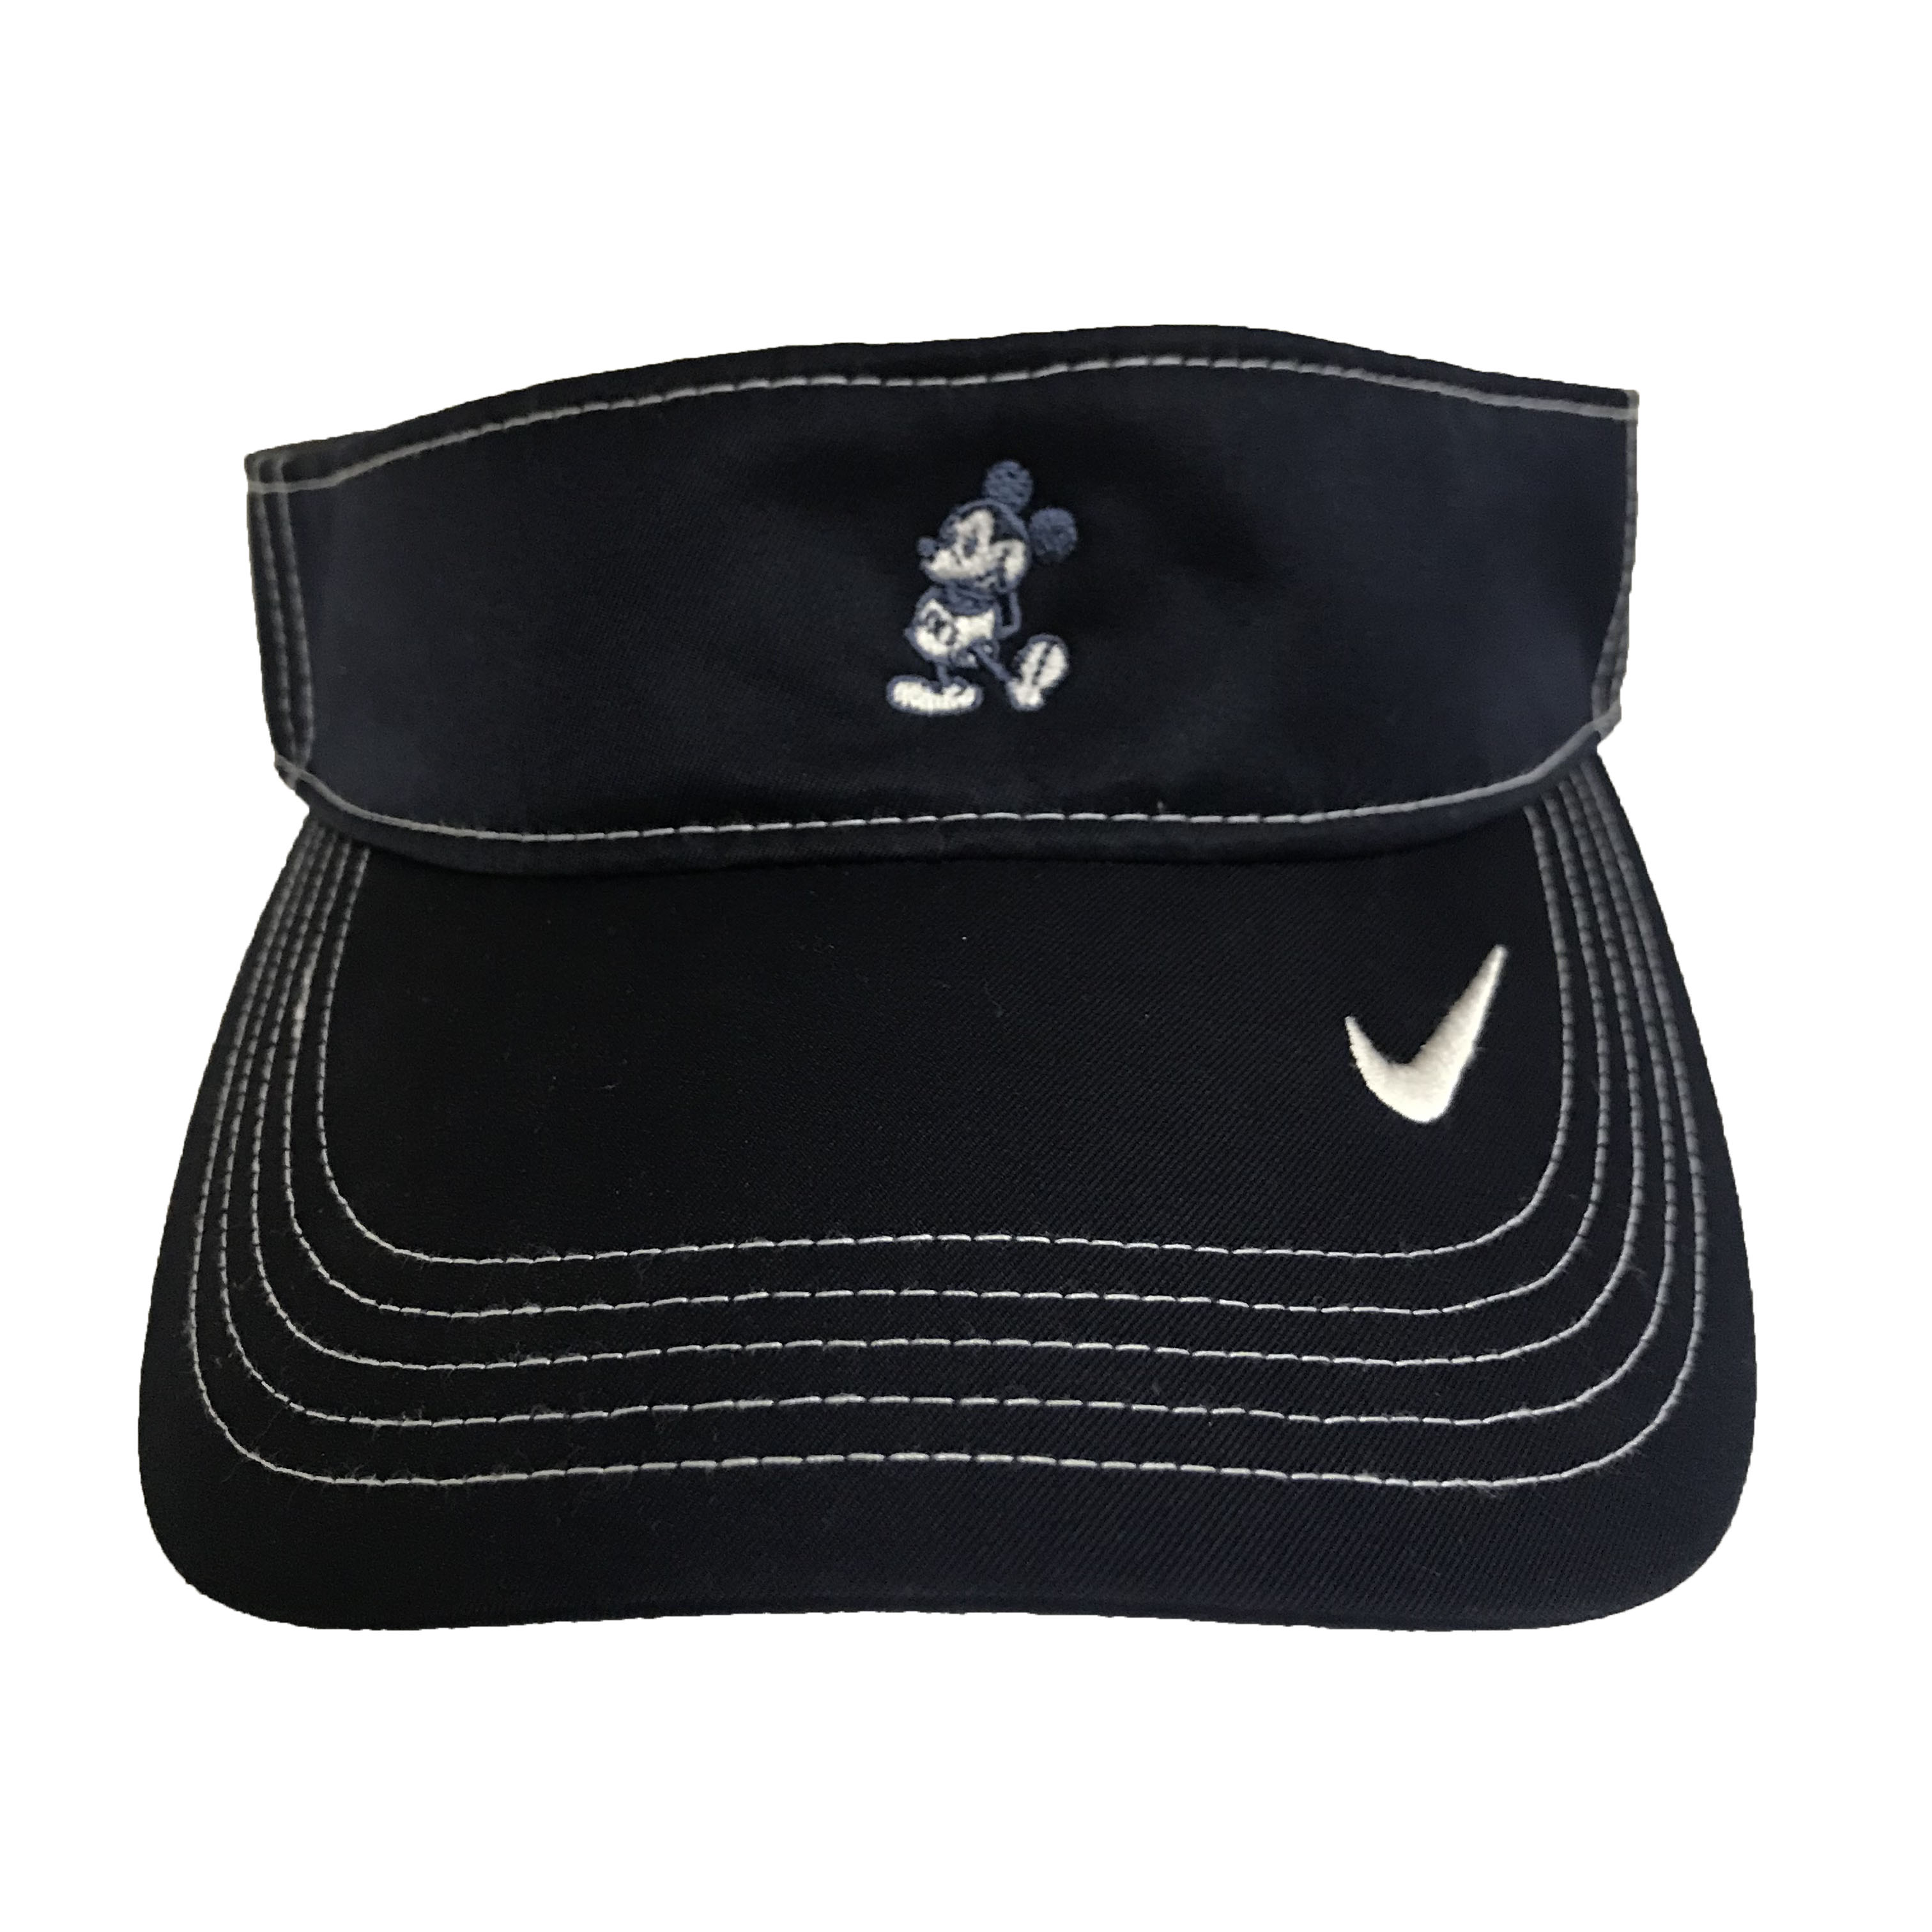 62efbcb4b11 Disney Sun Visor Hat - Nike Mickey Mouse - Navy